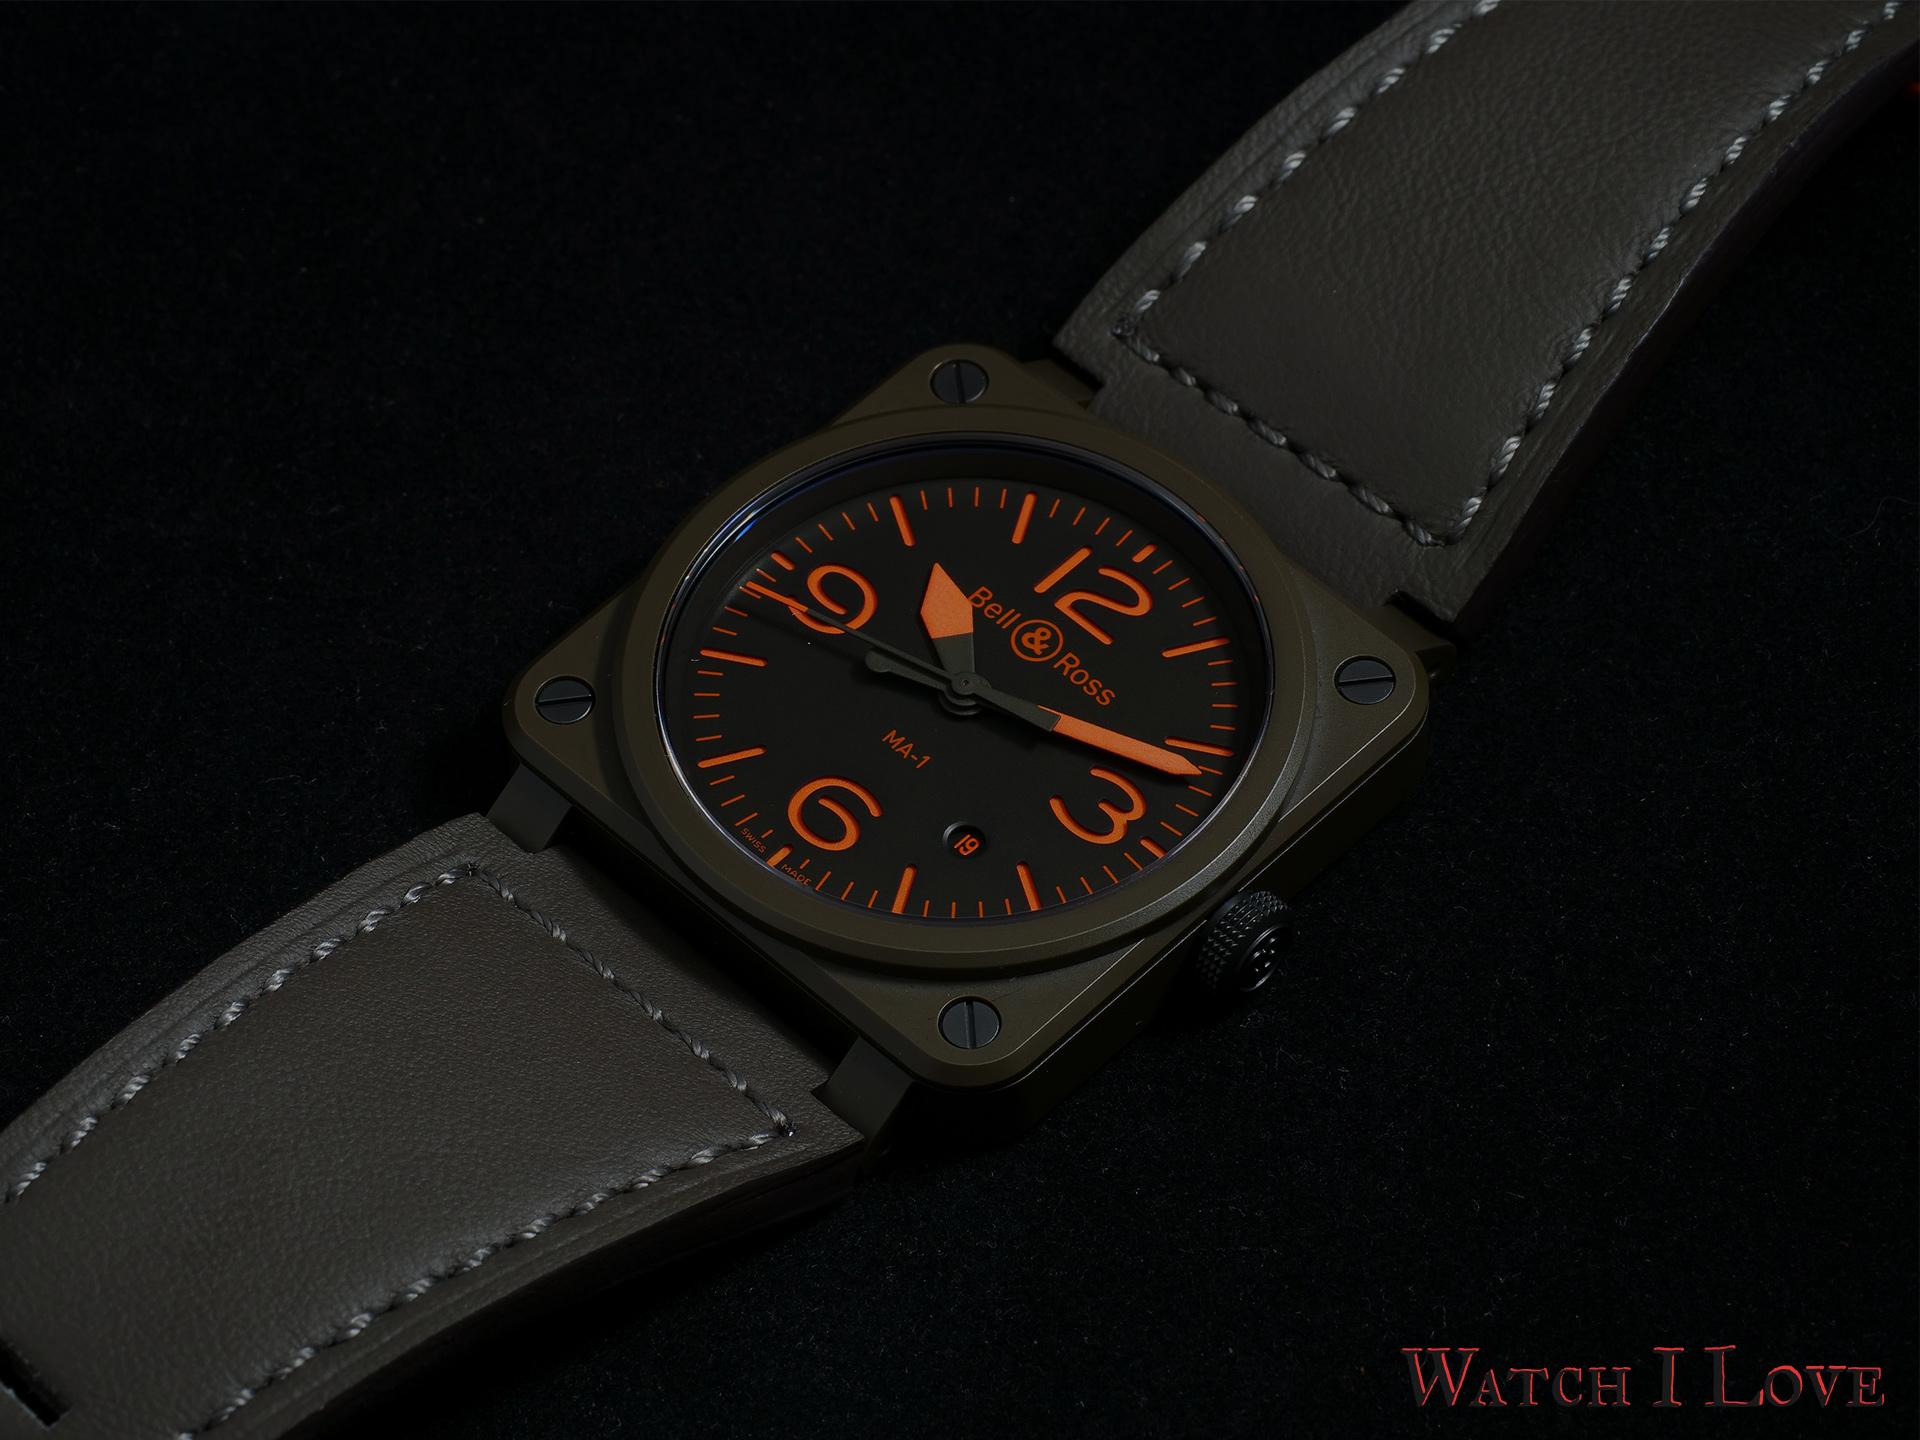 Bell & Ross BR 03-92 MA-1 watch